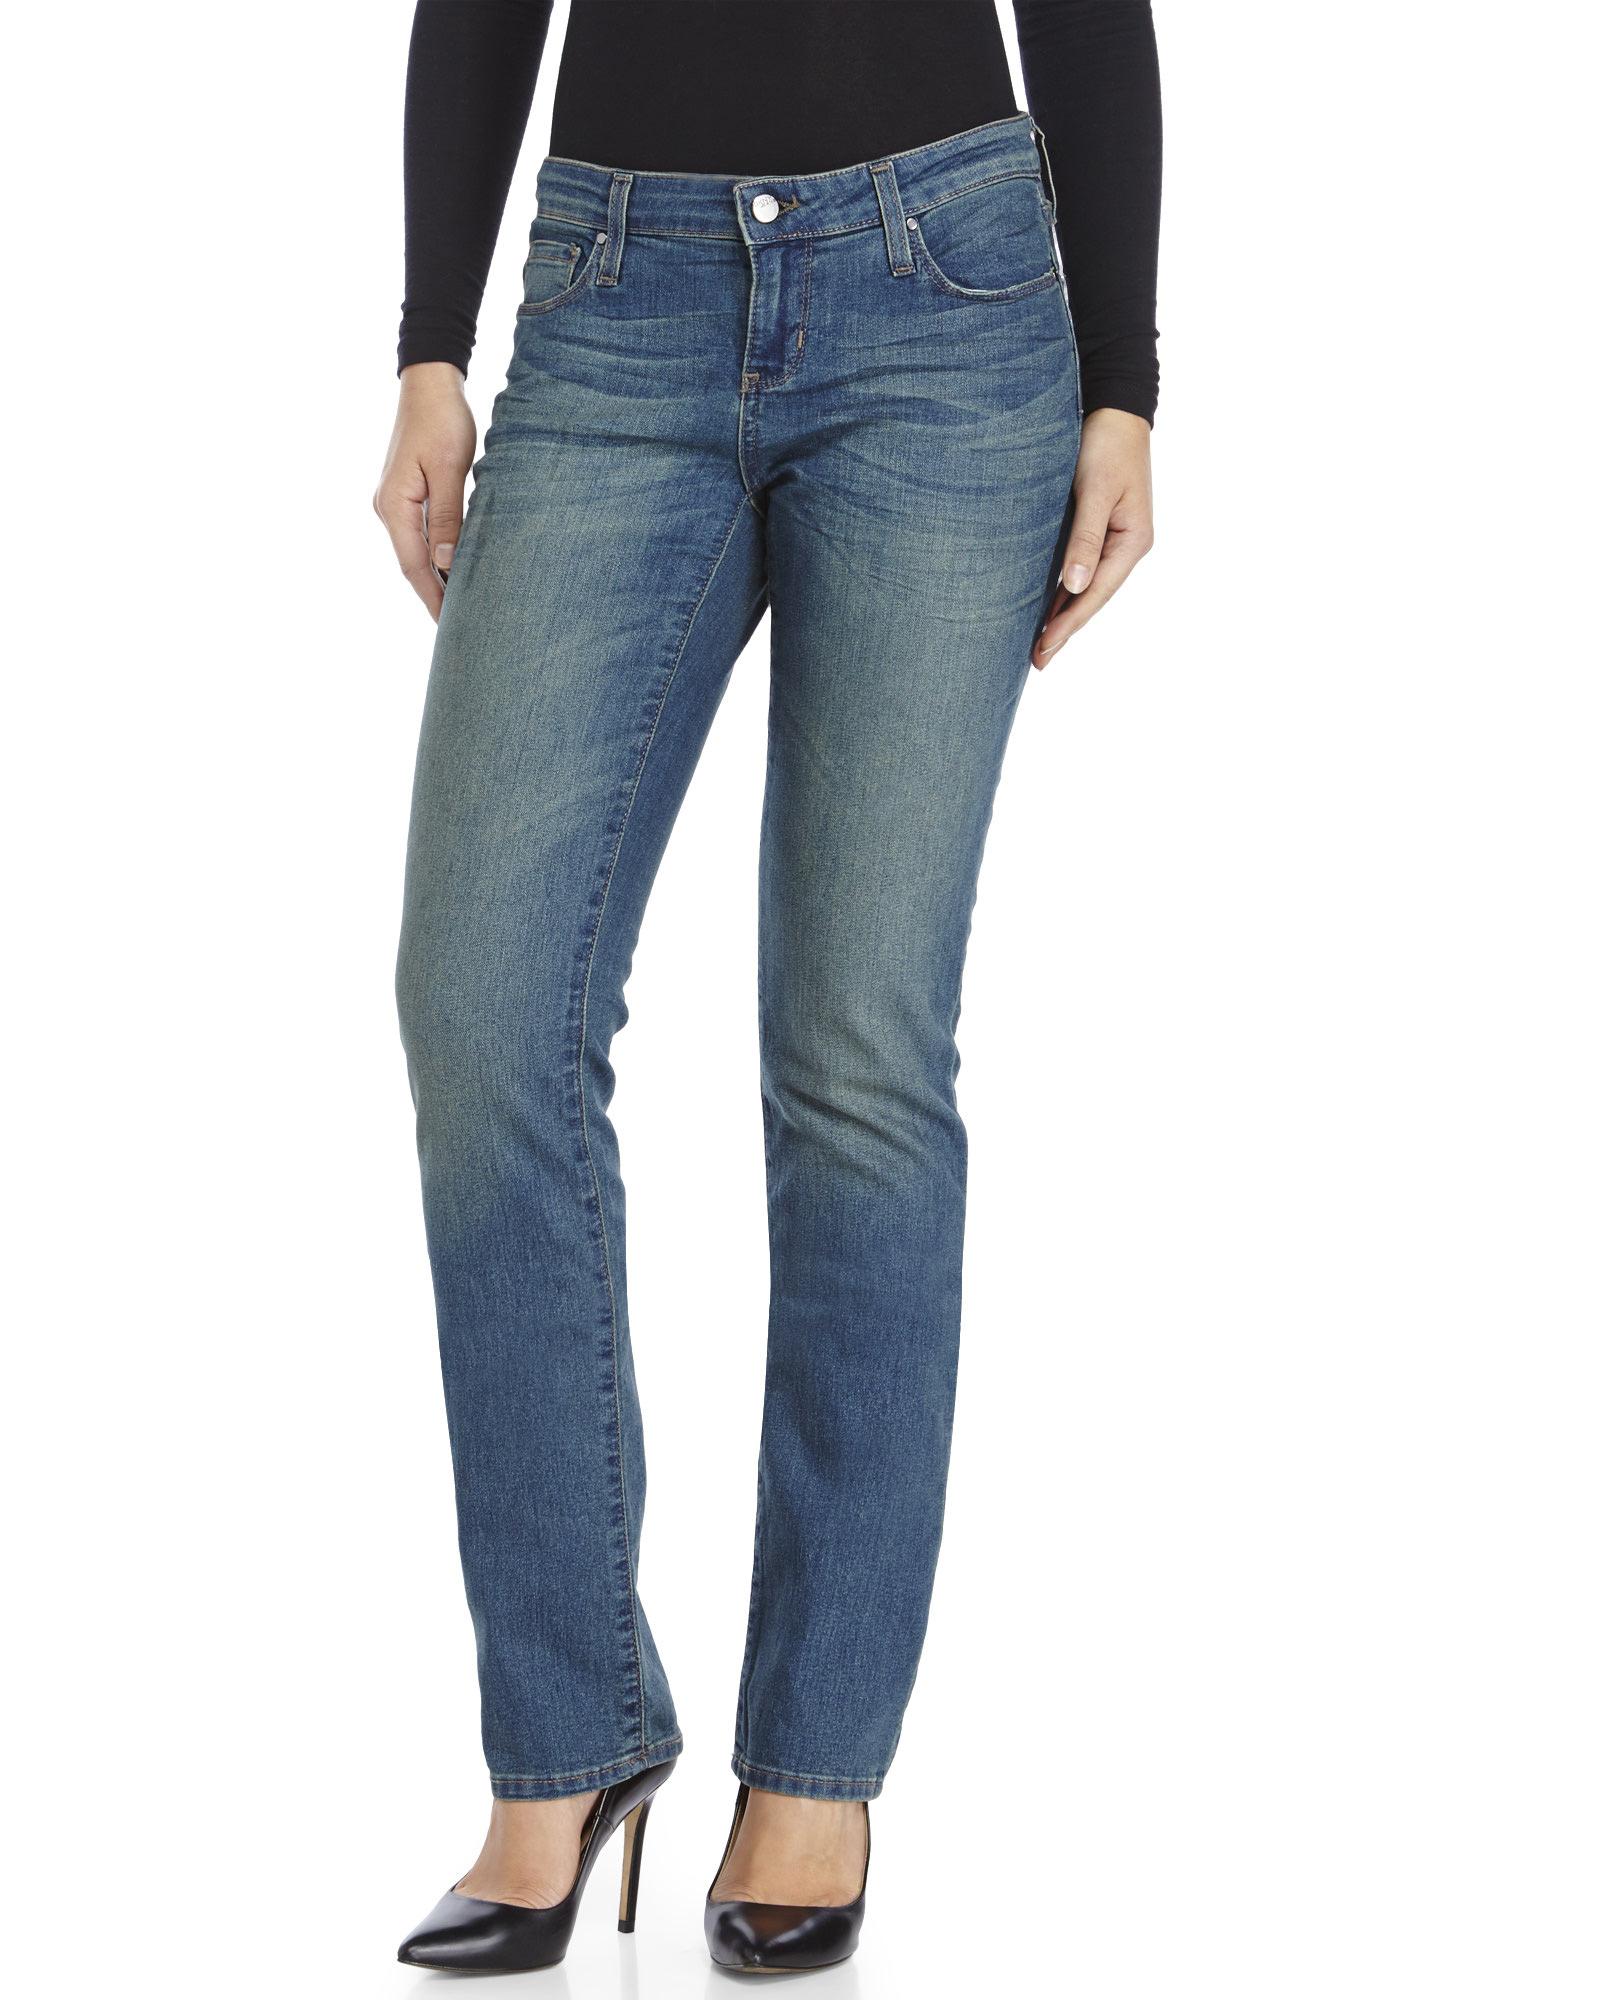 Dkny Curvy Skinny Jeans in Blue | Lyst